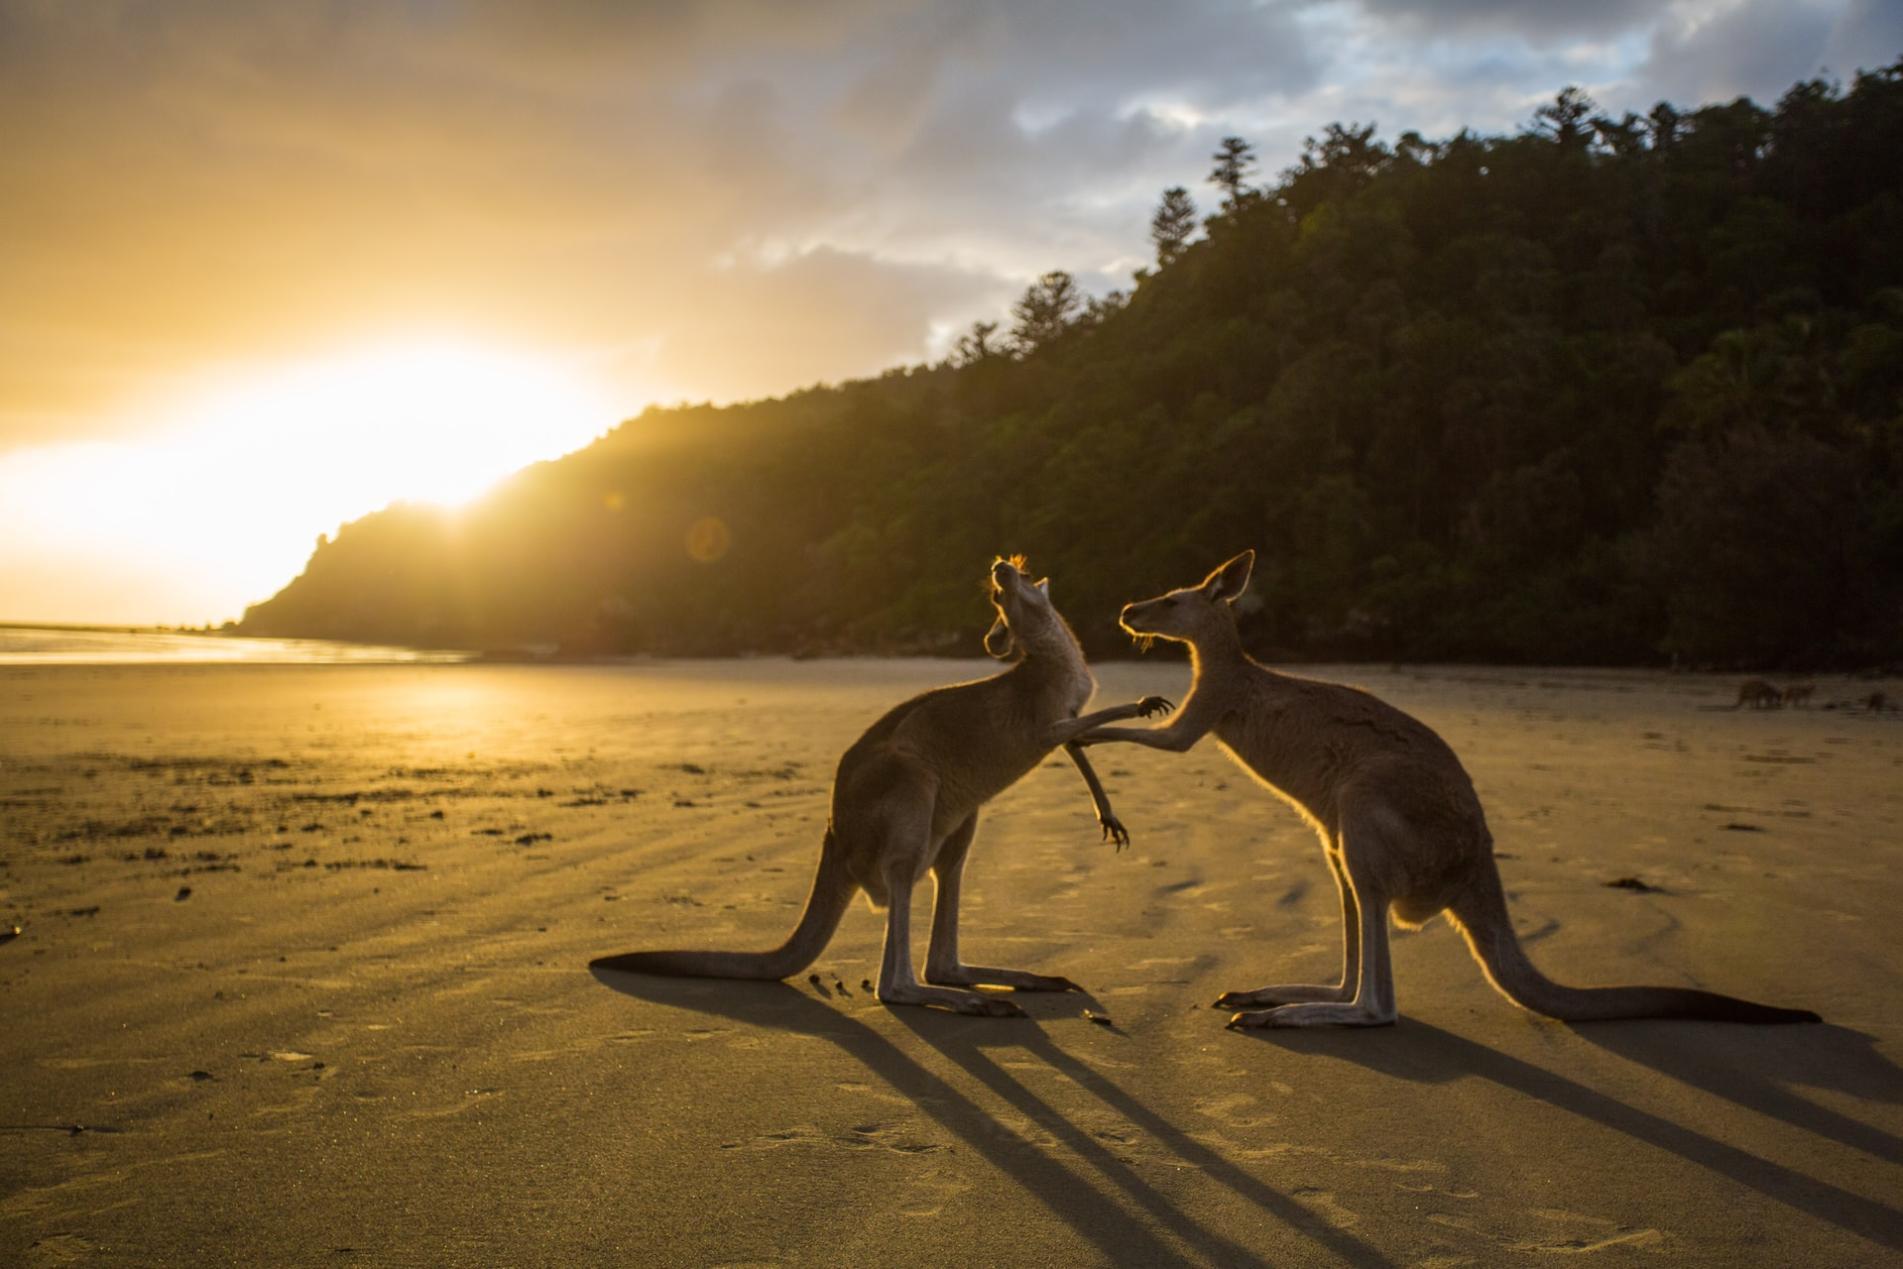 Kangaroo by Austin Elder from Unsplash